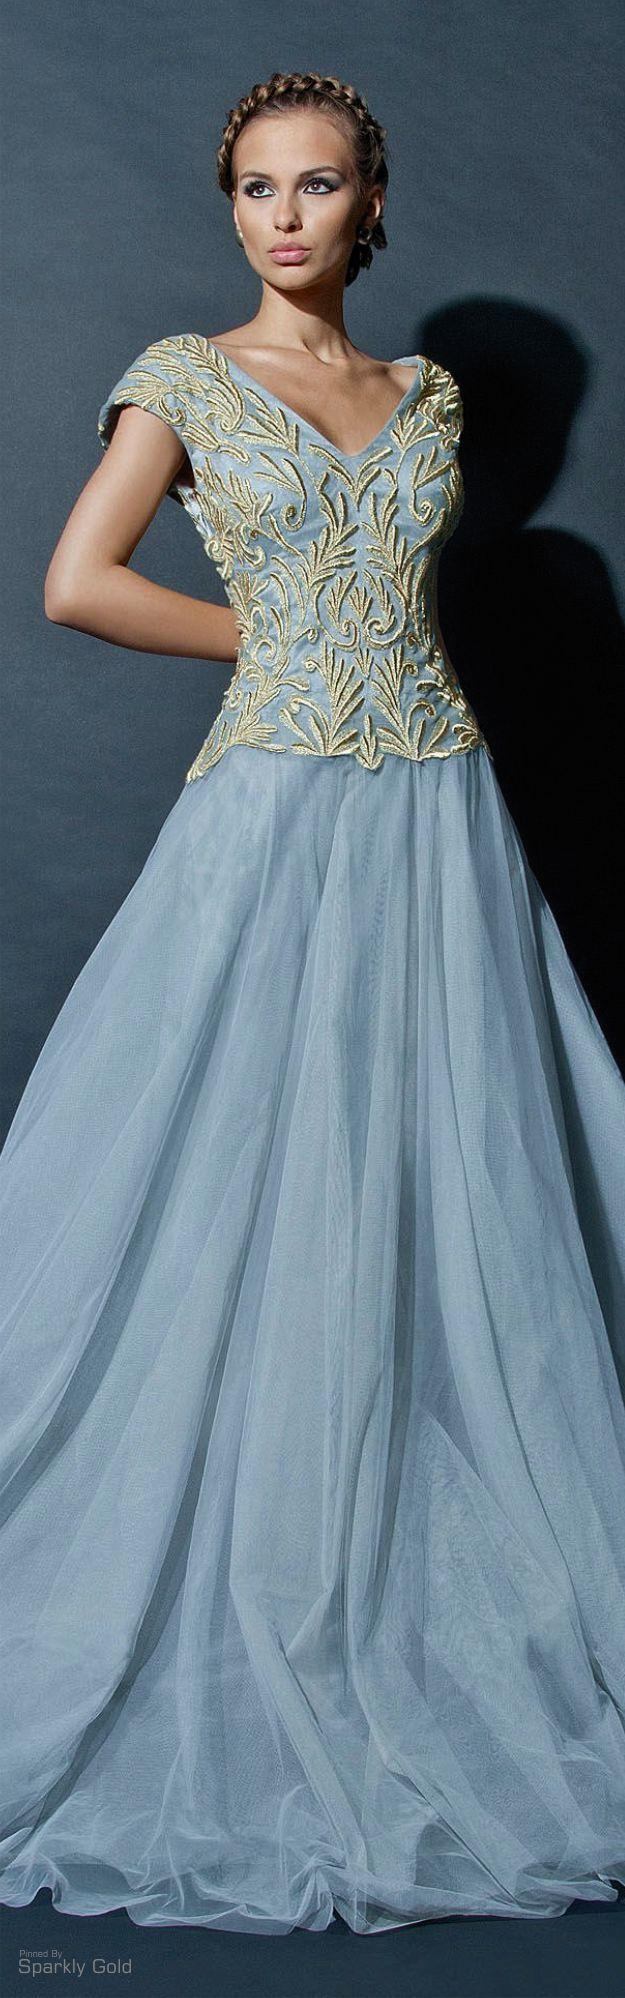 best vestidos images on pinterest evening gowns dream dress